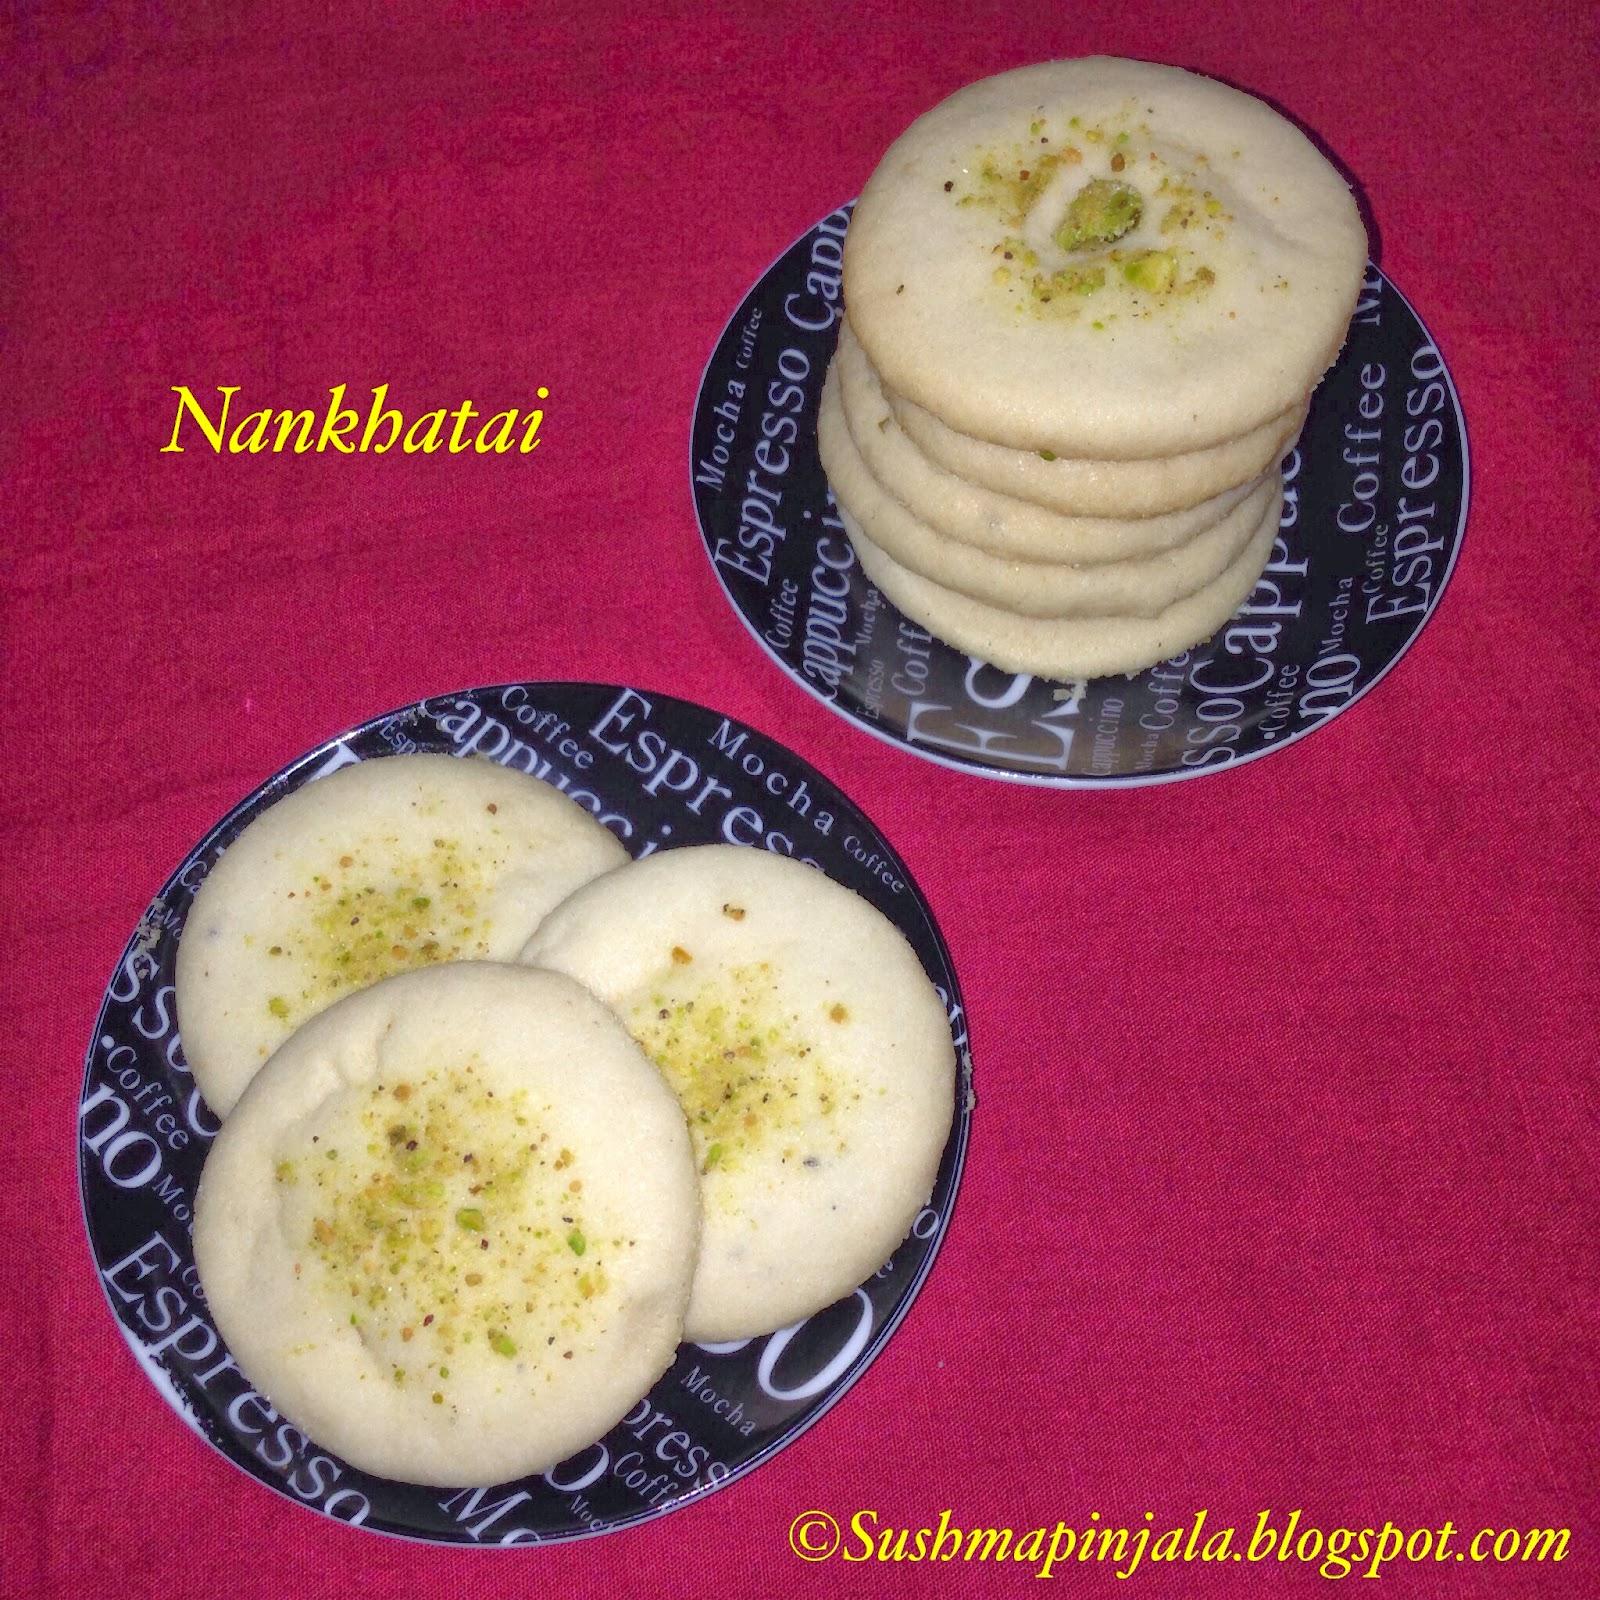 Nankathai / Eggless Cookies